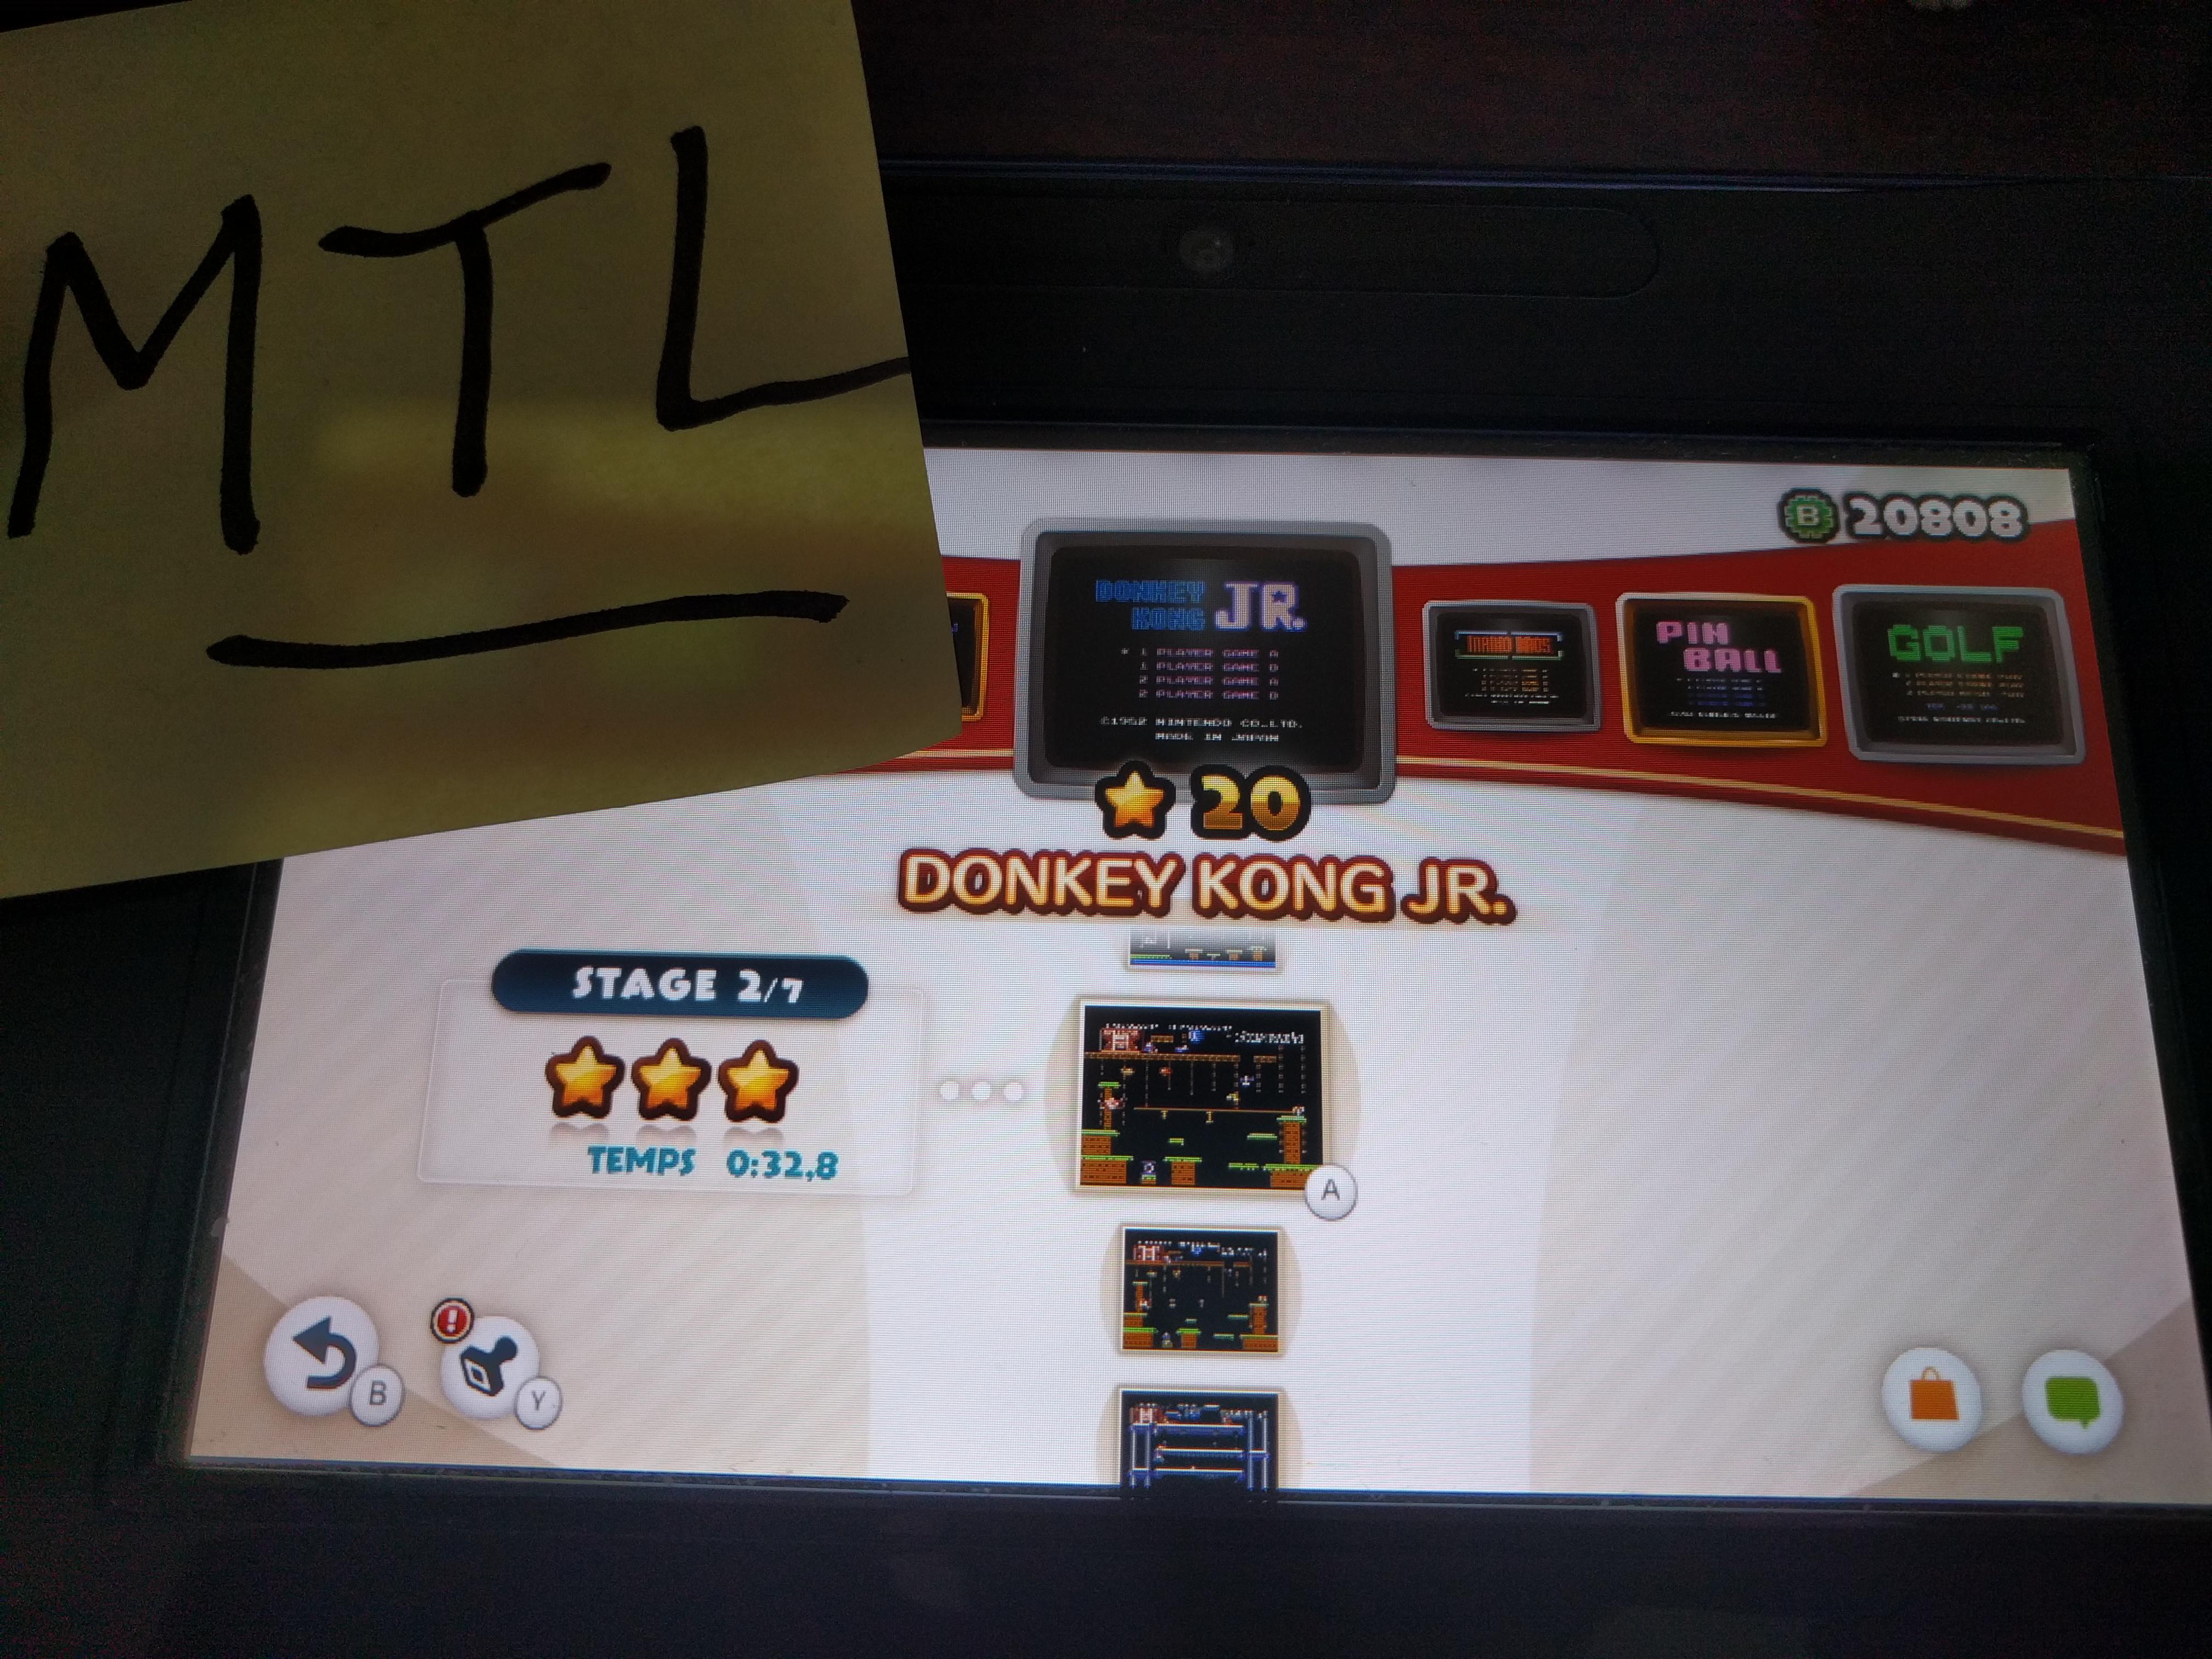 Mantalow: NES Remix: Donkey Kong JR: Stage 2 (Wii U) 0:00:32.8 points on 2016-06-06 16:37:48